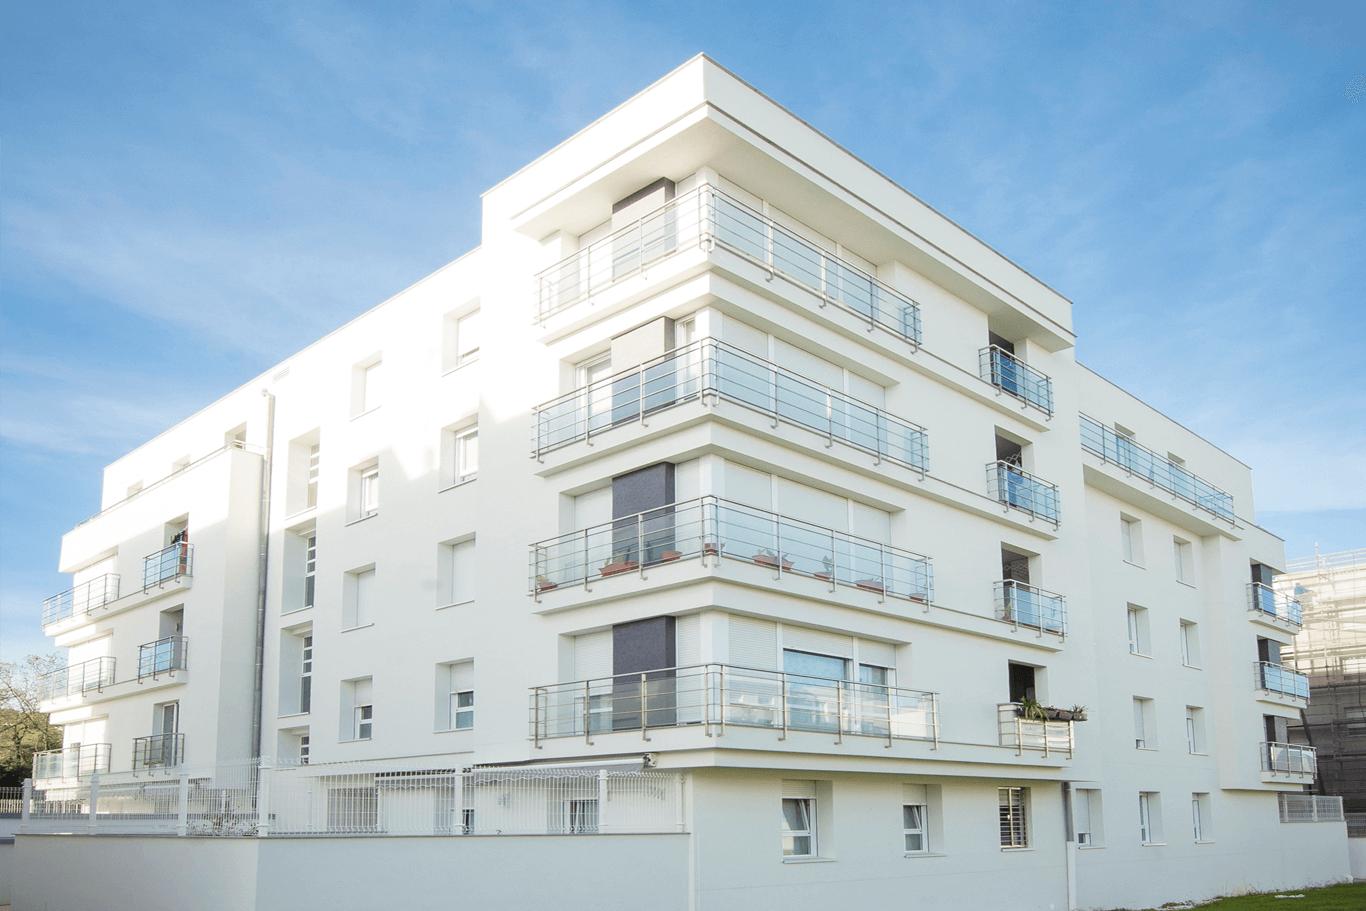 Alai 17-rehabilitacion- comunidades-SATE fachadas-xs arkitektura-arquitectos-zarauz-1